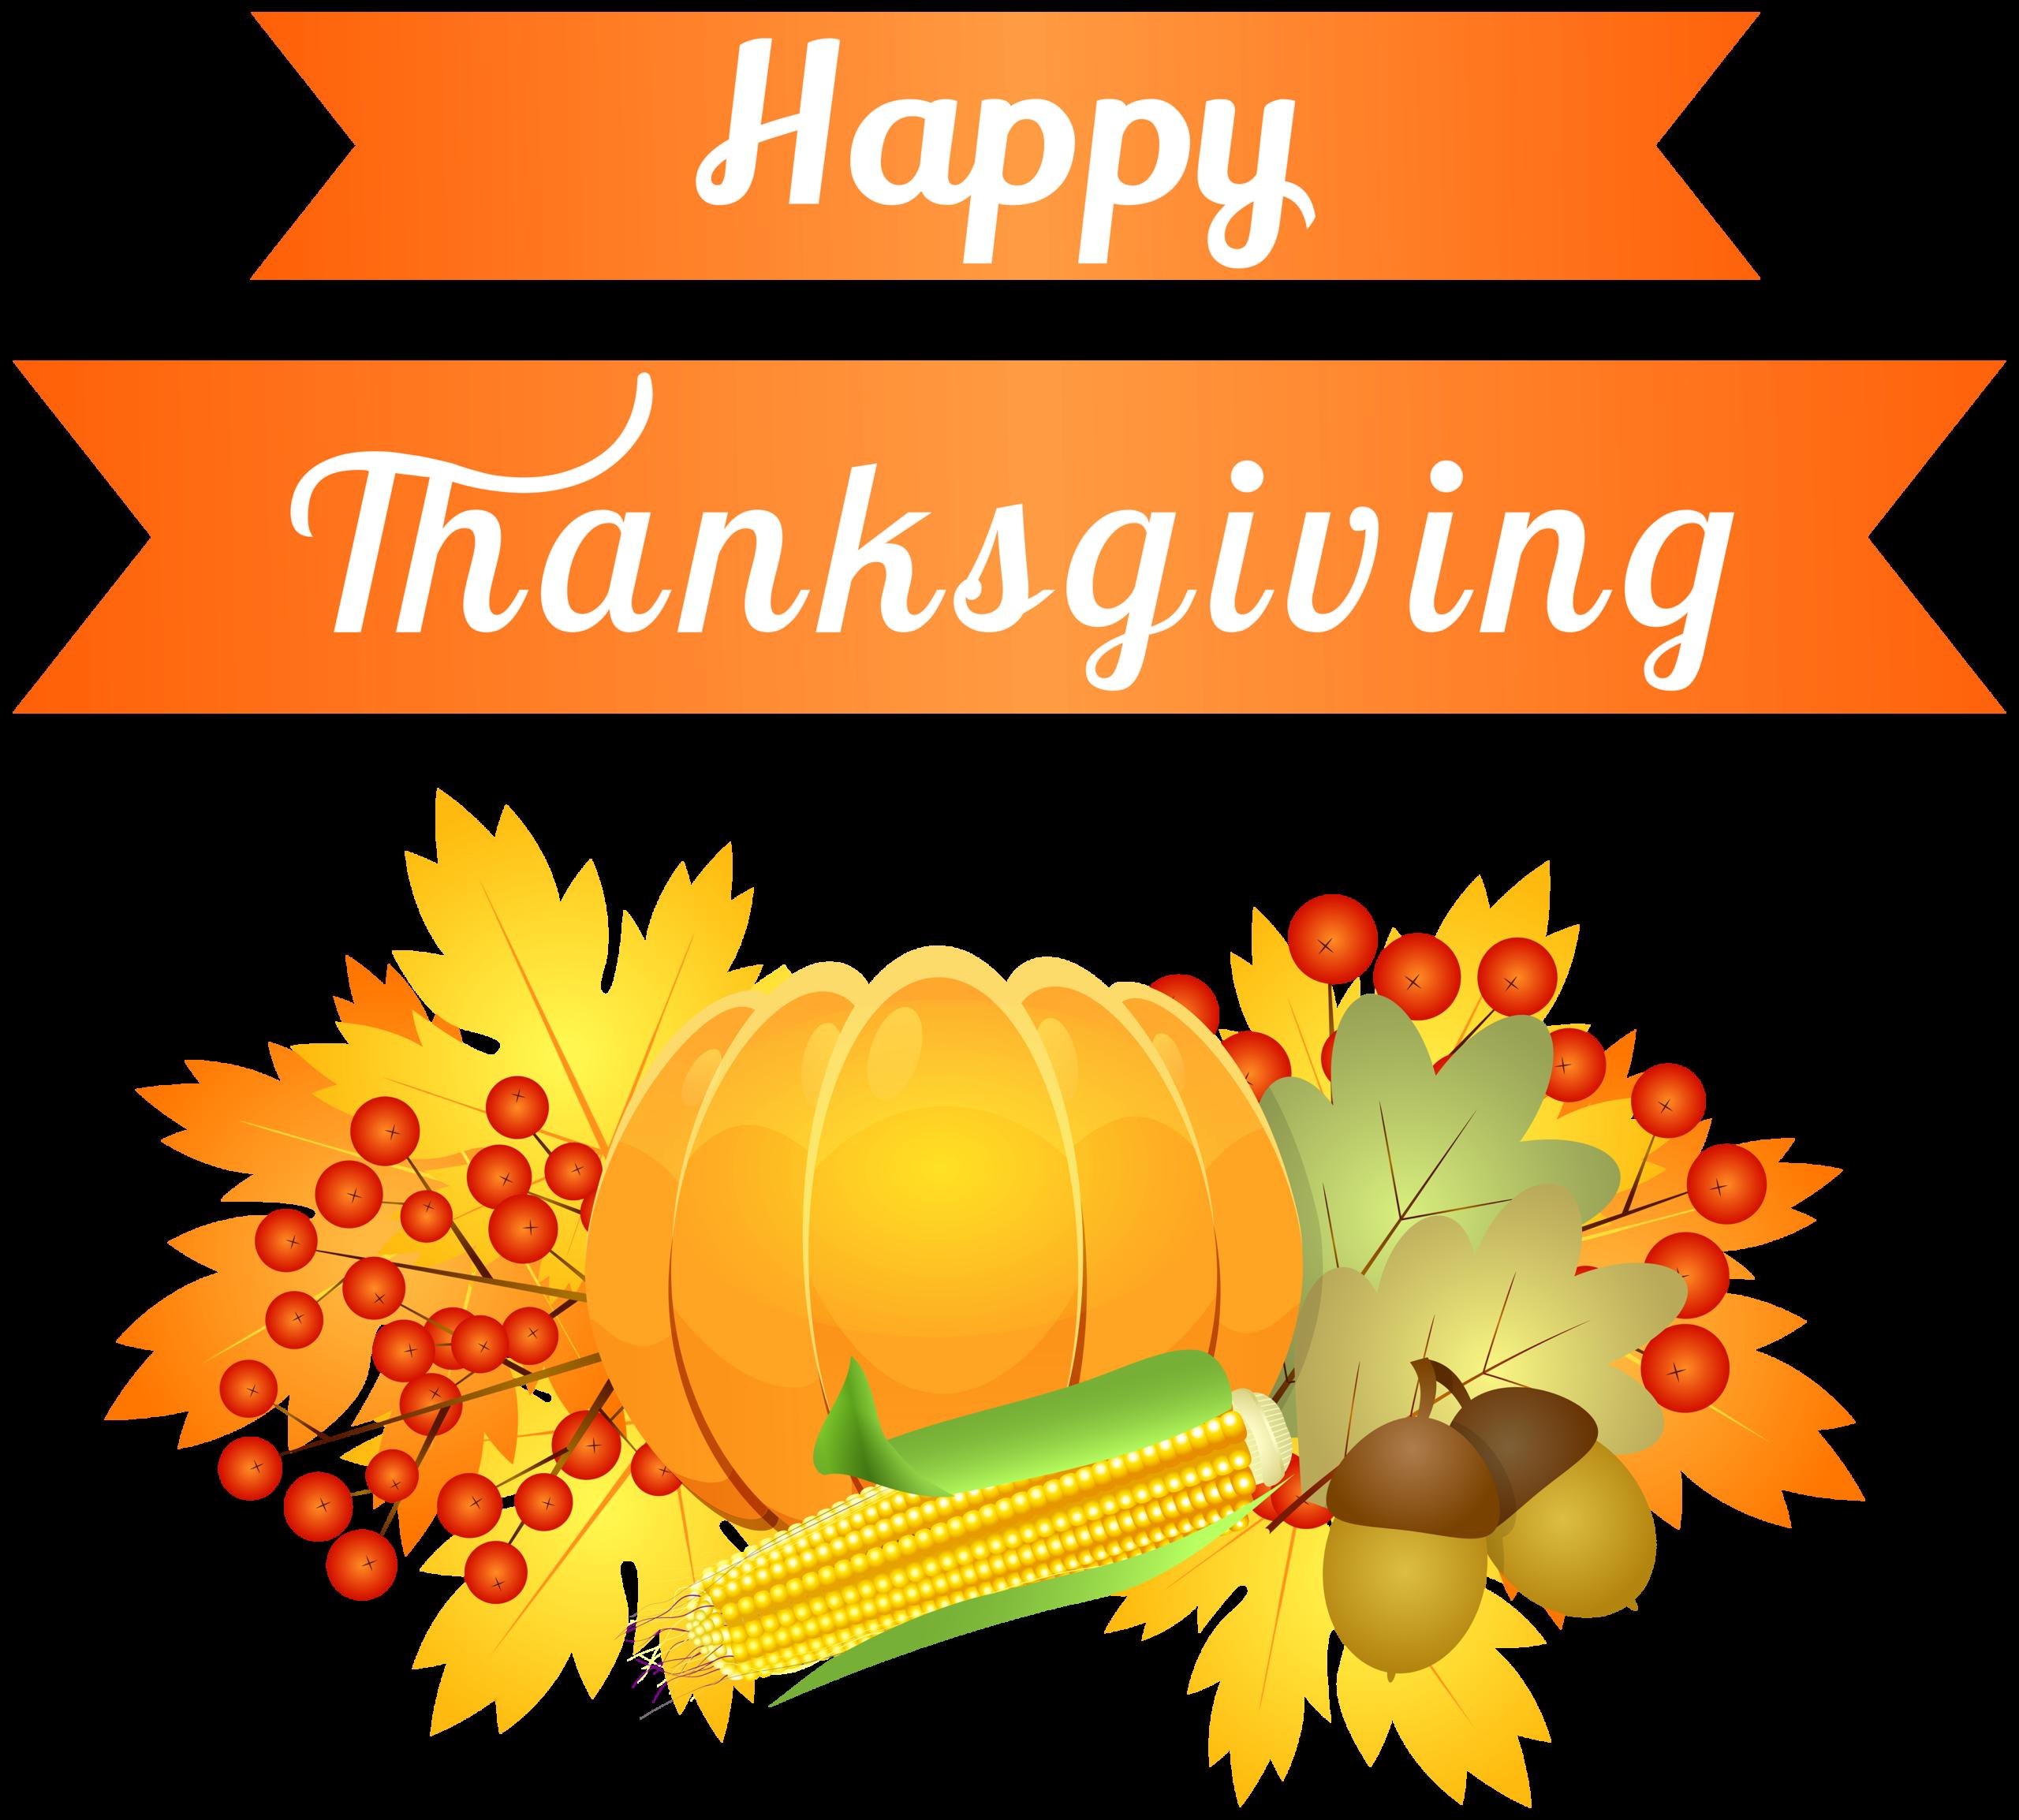 Free Thanksgiving Turkey Clipart Thanksgiving Clip Art Funny Thanksgiving Images Happy Thanksgiving Day